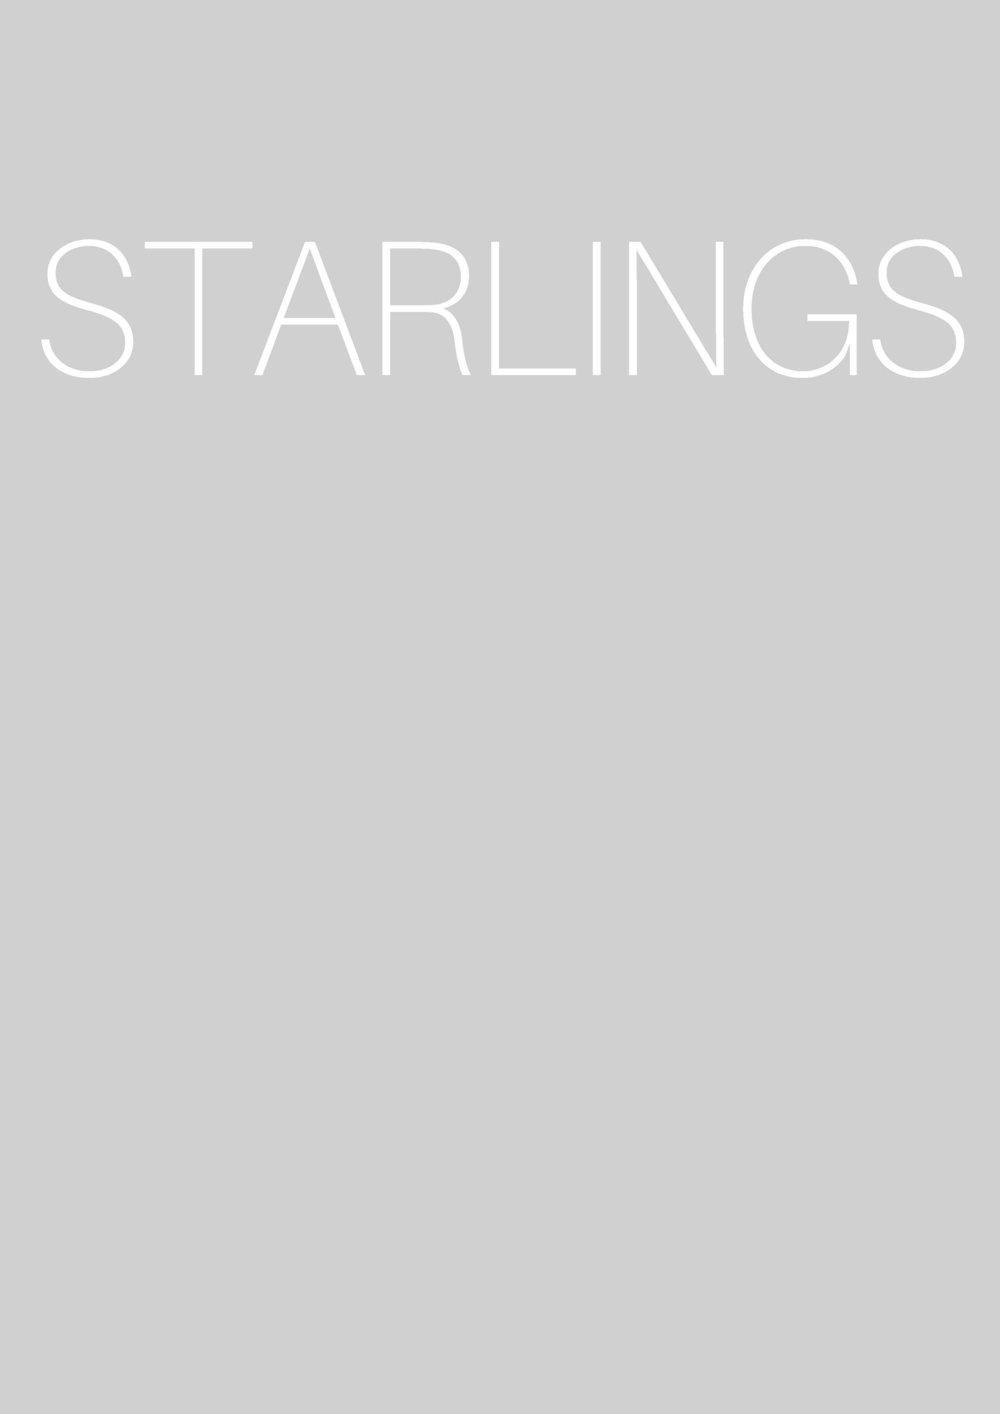 2 DEAD STARLINGS_Page_3.jpg